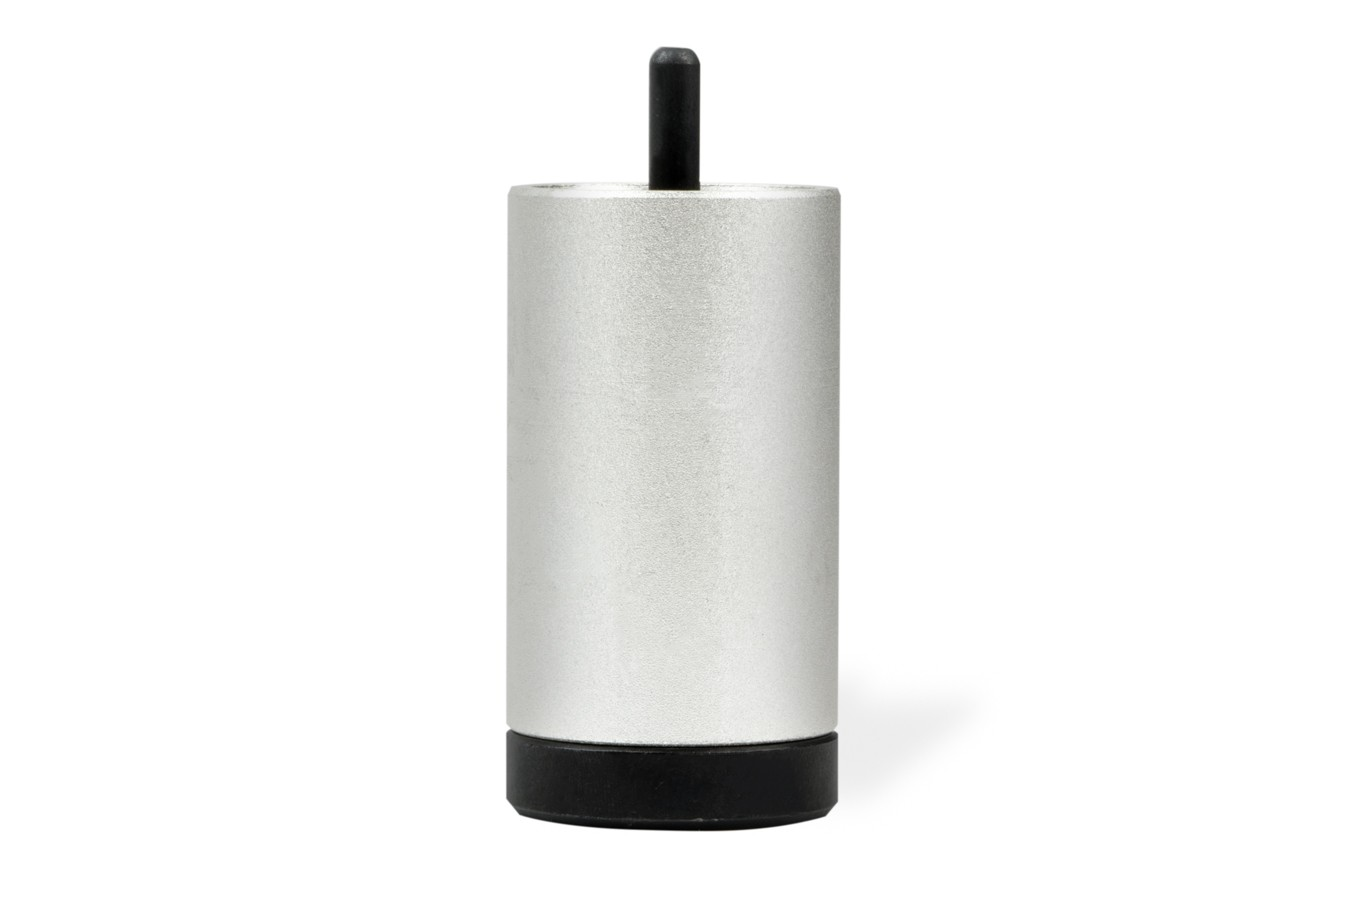 Ferramenta para Instalar Aranha Estrela  28.6mm - Ice Toolz